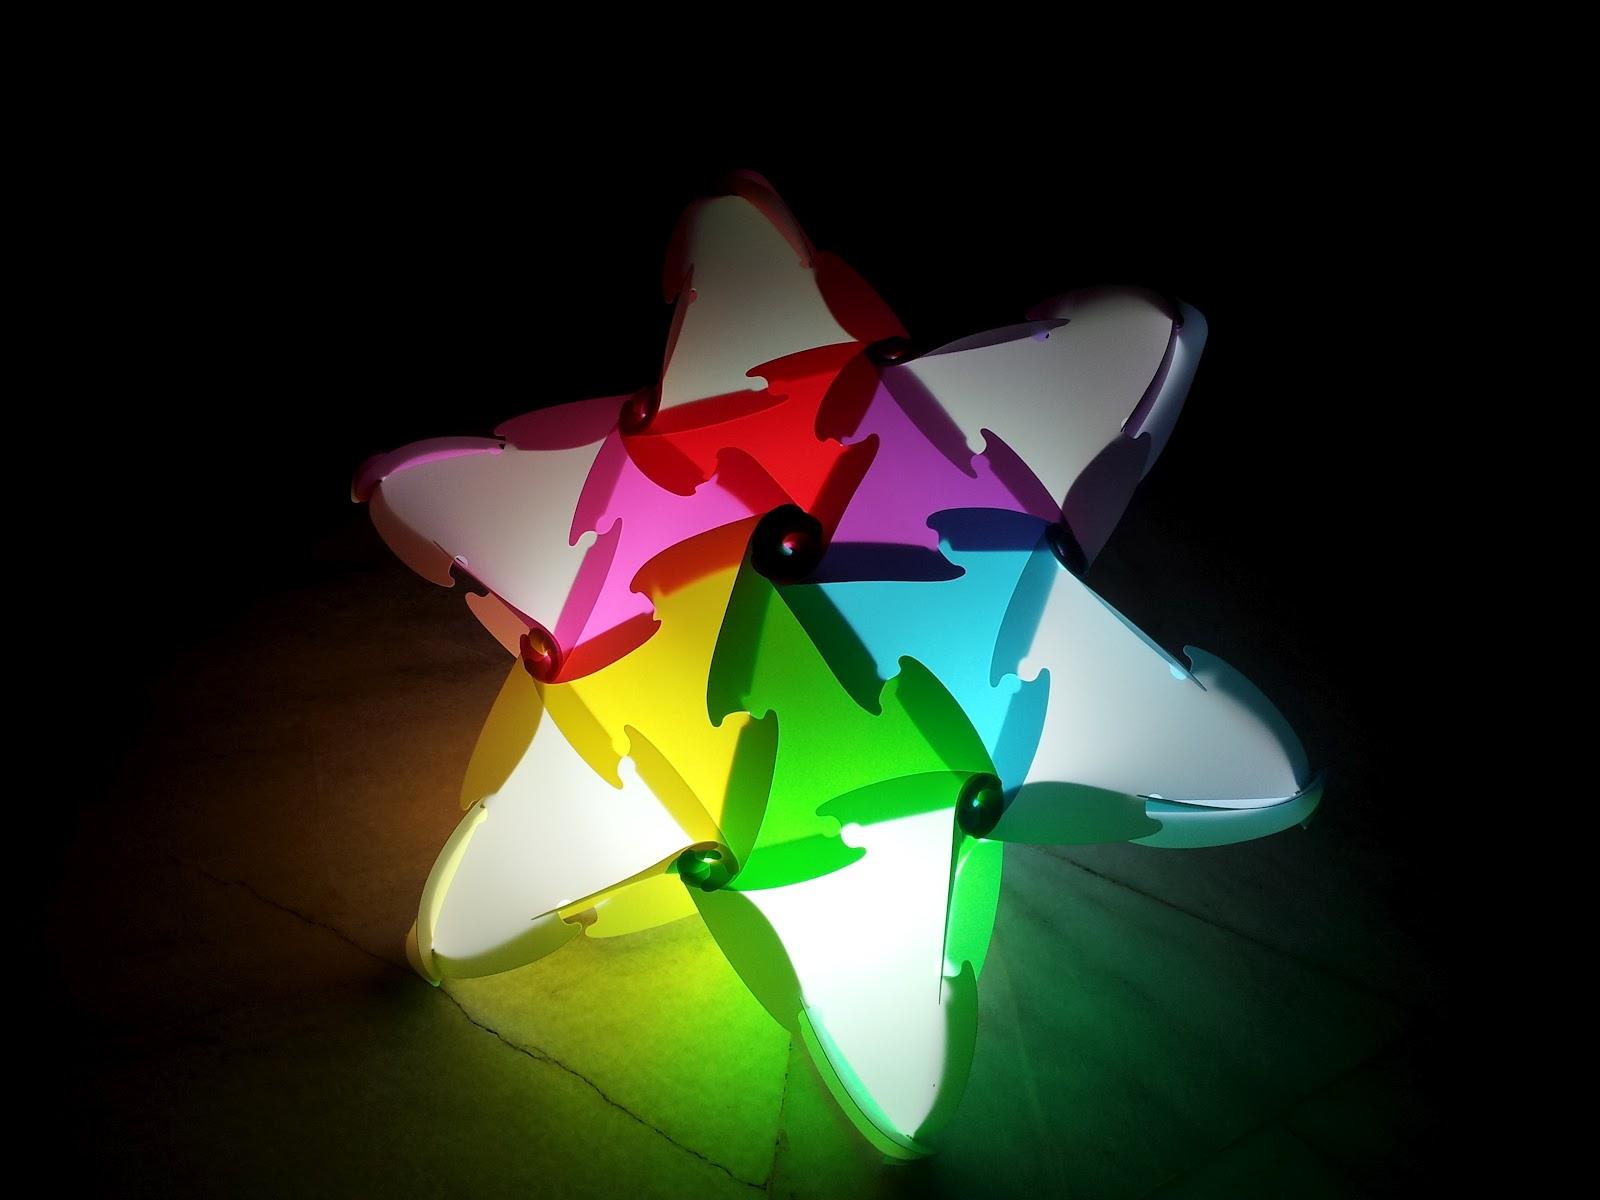 vlightdeco iq light puzzle pendant jigsaw lamp styles 09 01 12. Black Bedroom Furniture Sets. Home Design Ideas